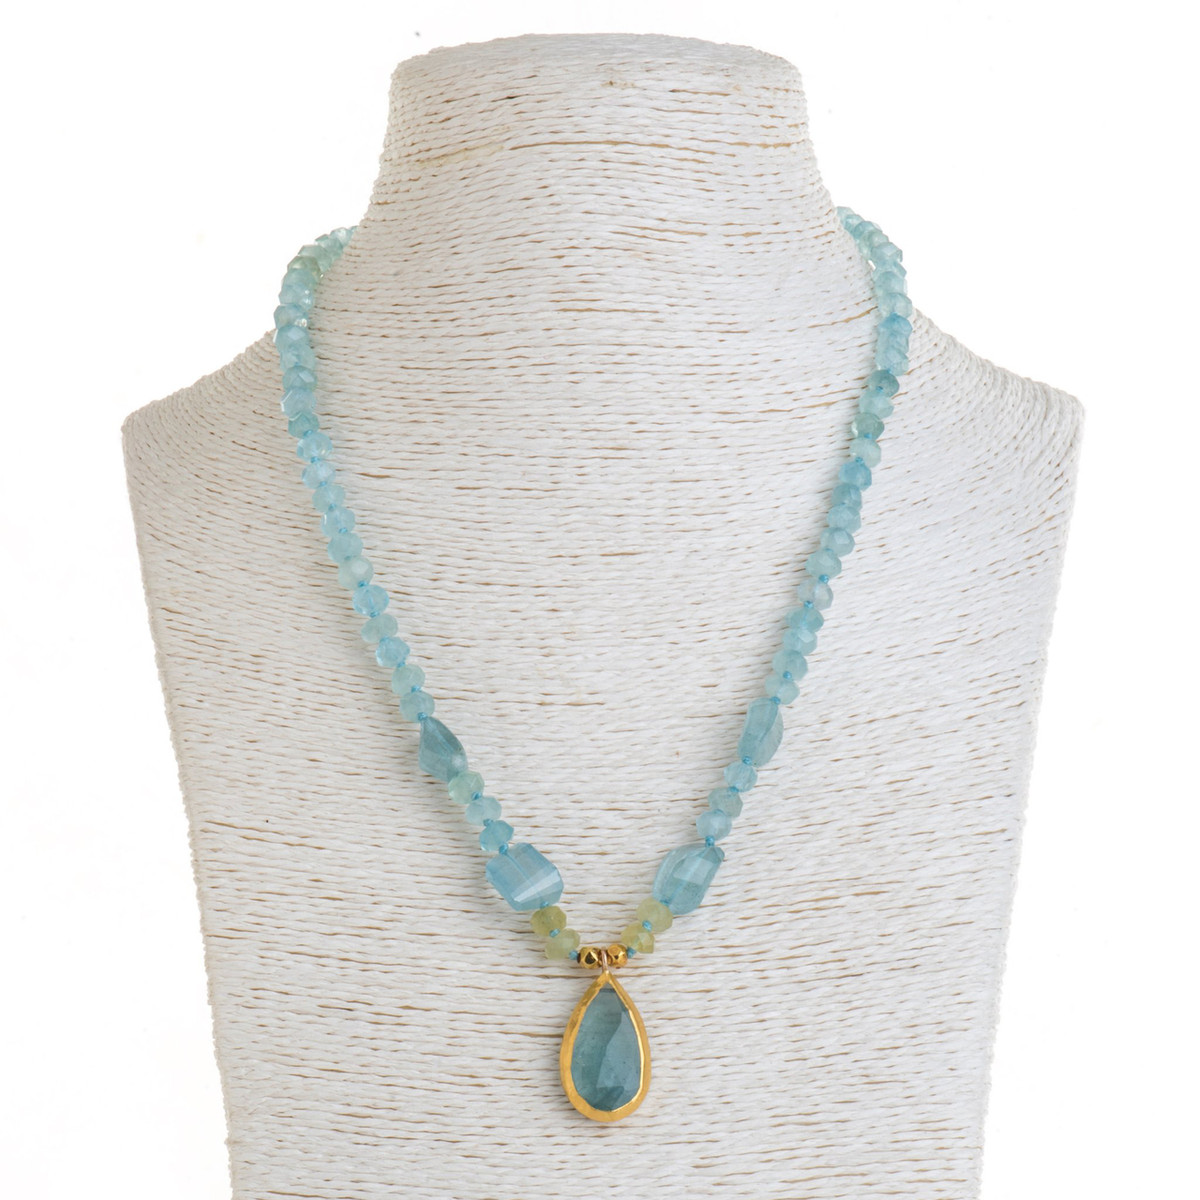 Aqua Sensation Necklace by Nava Zahavi - New Arrival